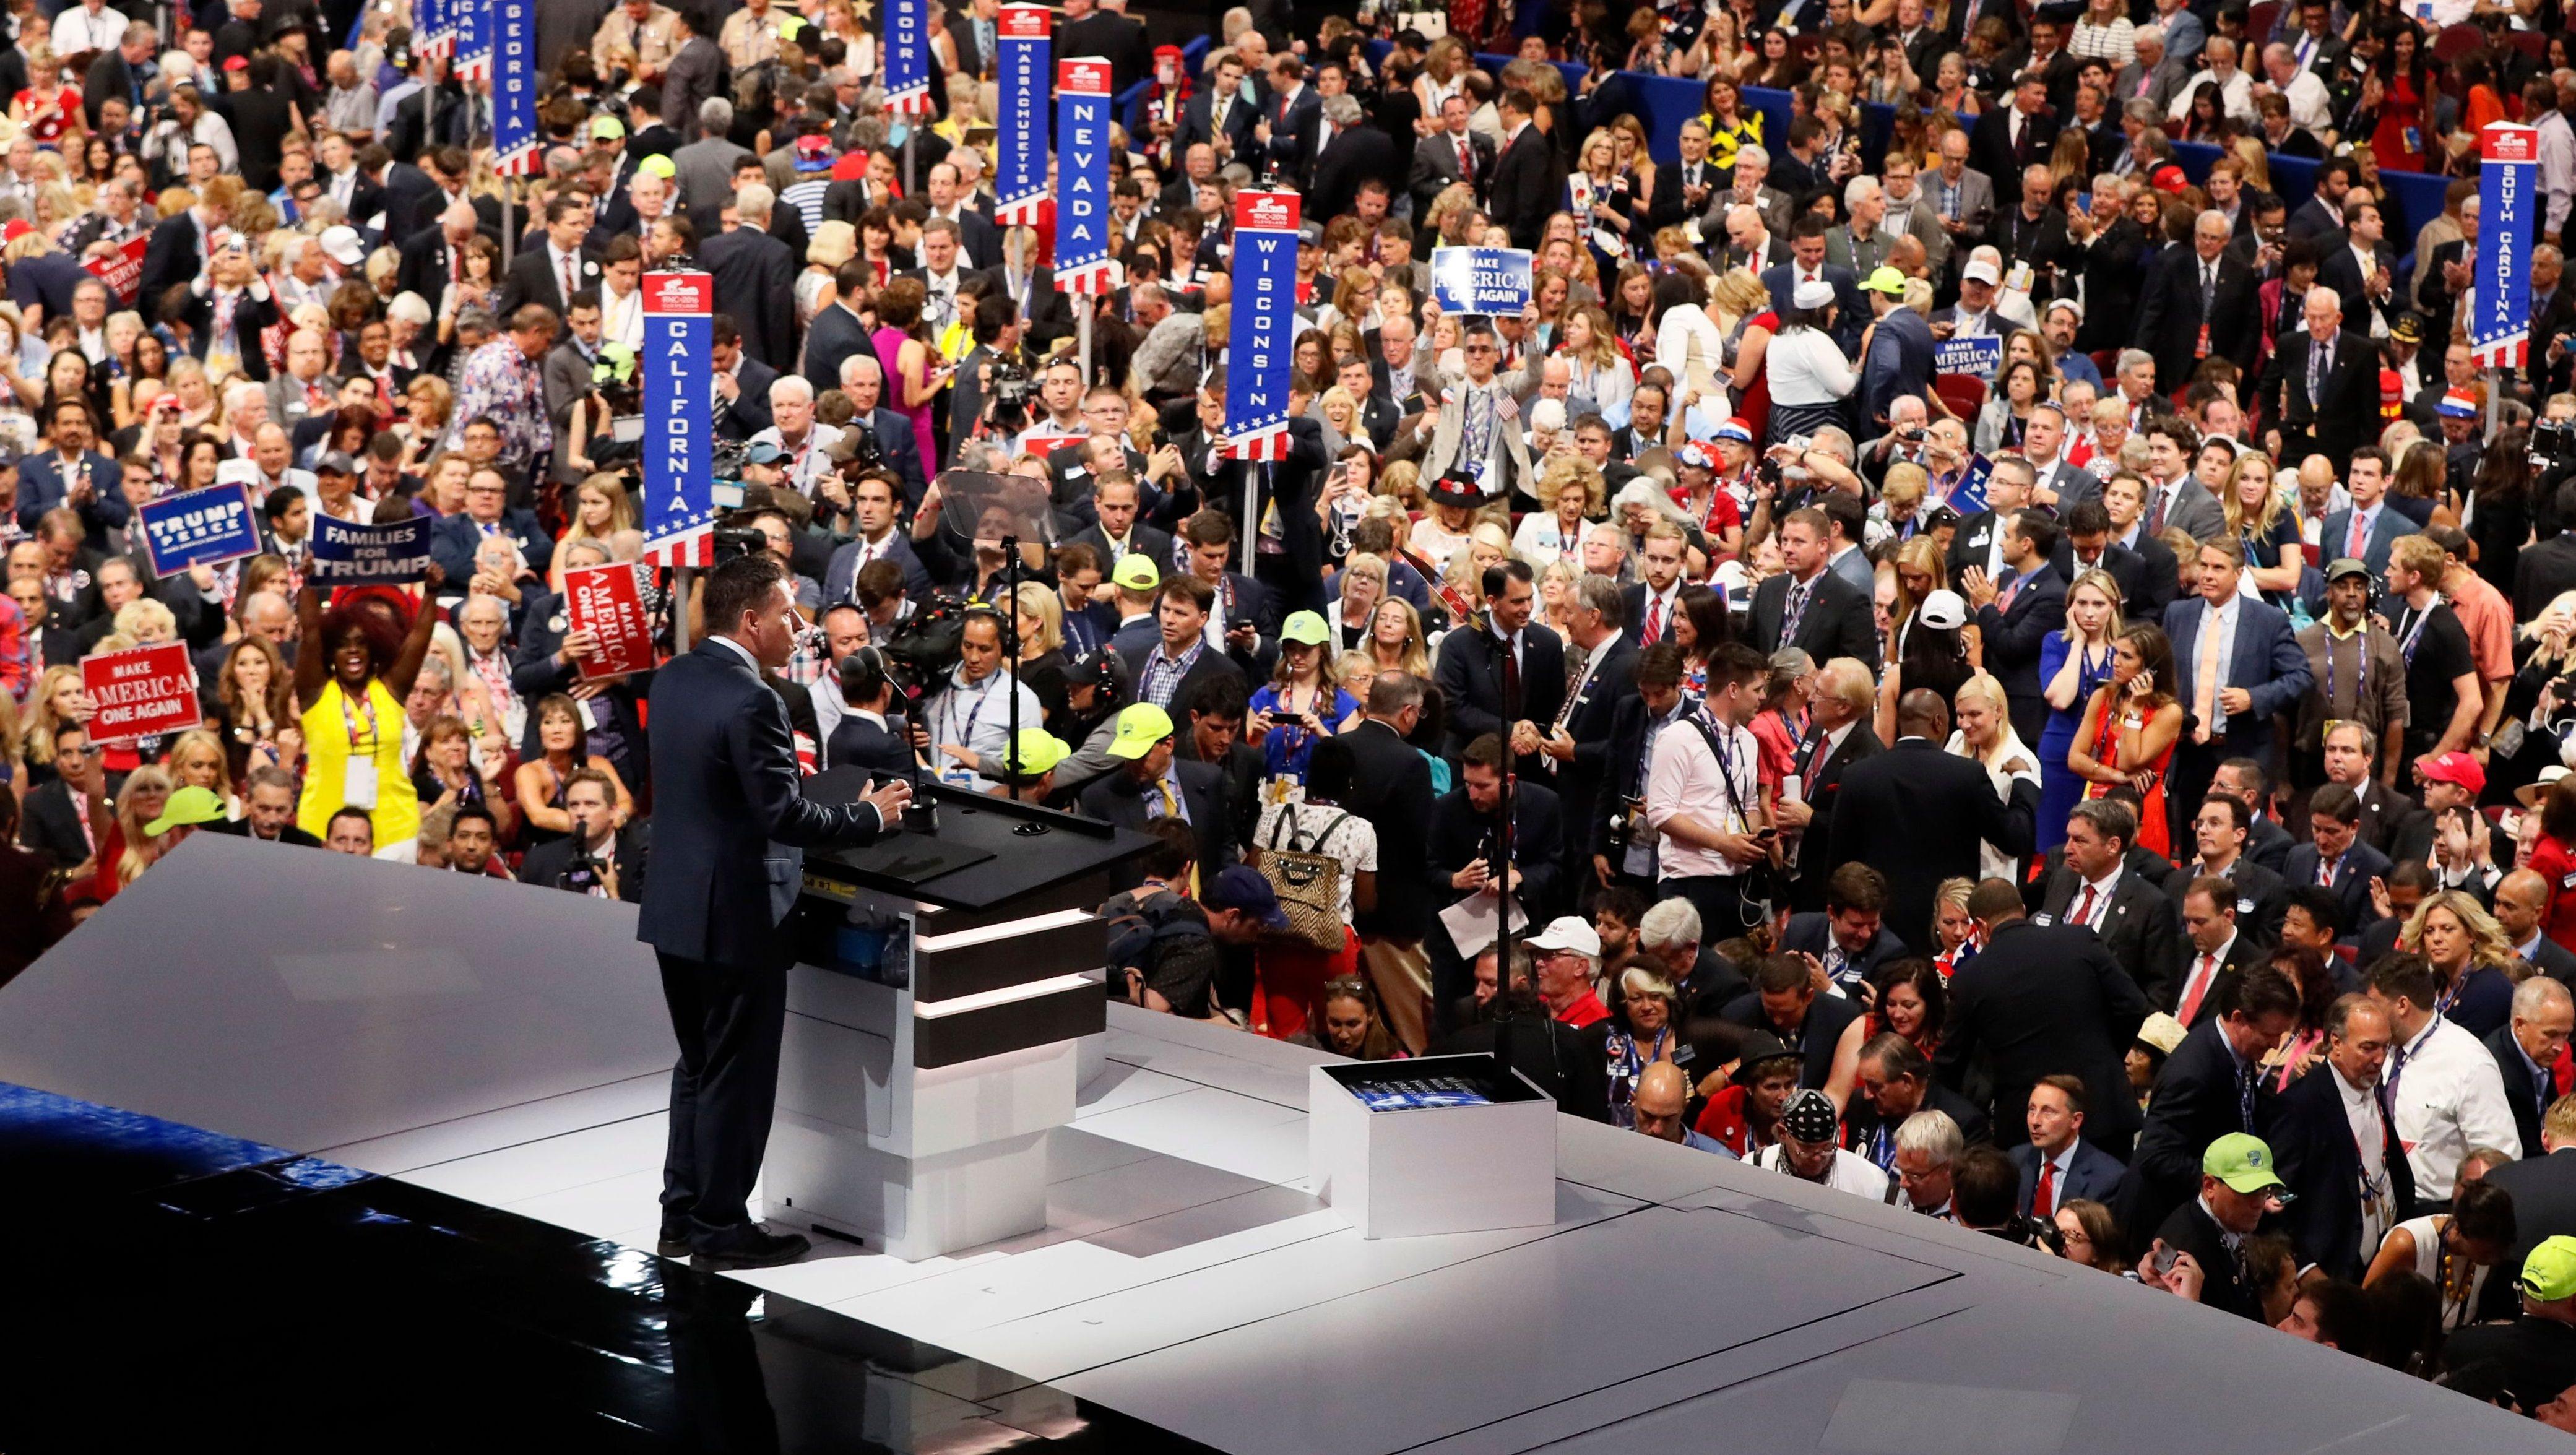 Tech entrepreneur Peter Thiel speaks at the Republican National Convention in Cleveland, Ohio, U.S. July 21, 2016. REUTERS/Rick Wilking - HT1EC7M03ZOA8